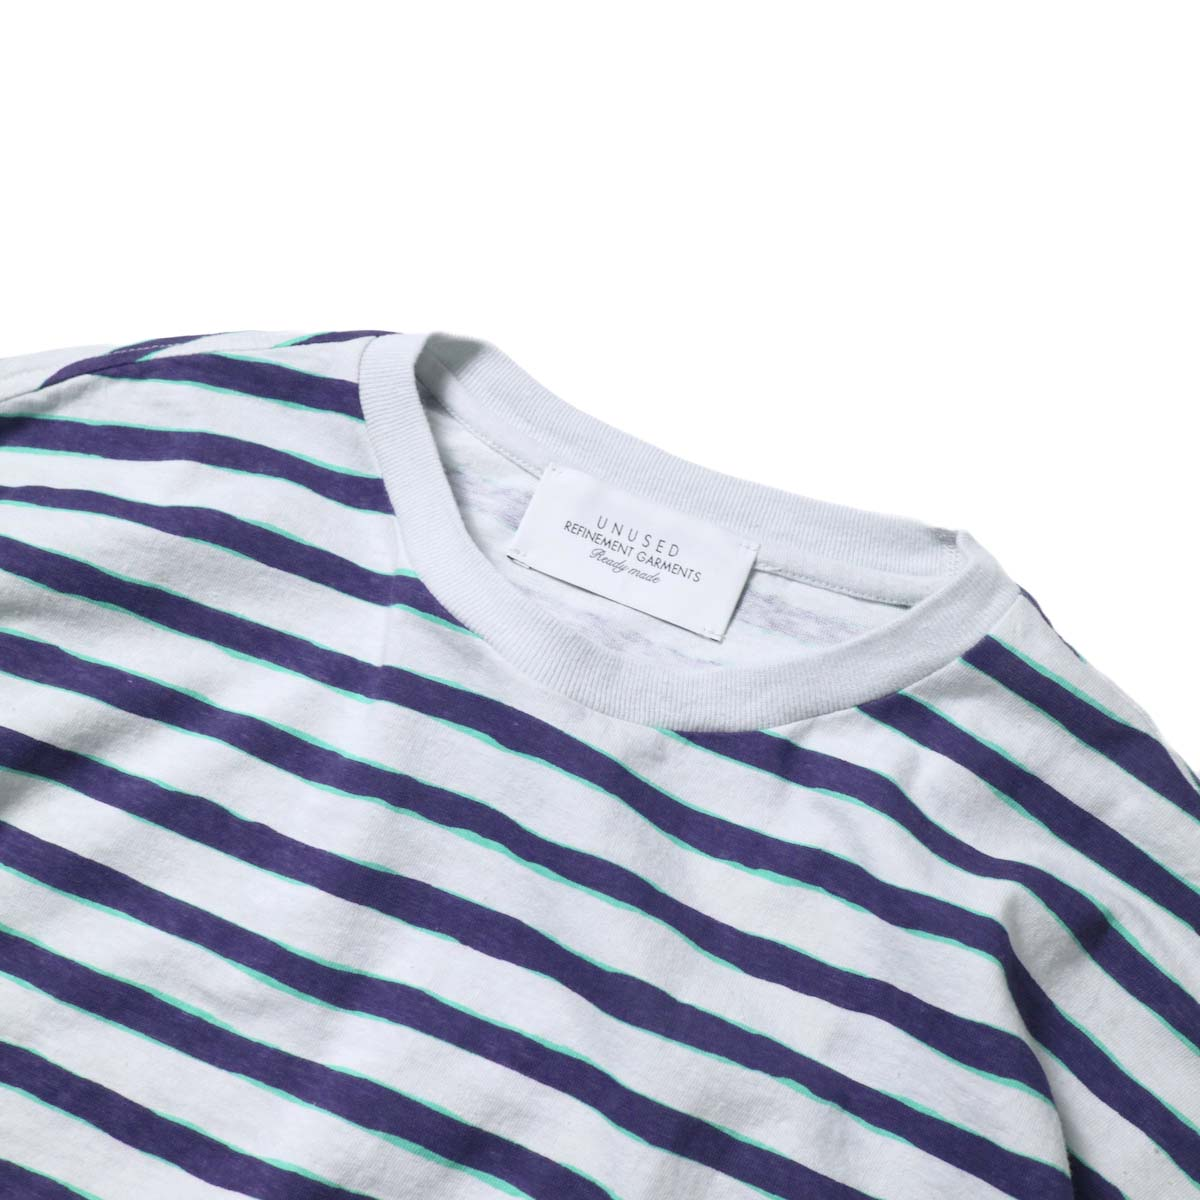 UNUSED / US2021 Short sleeve print border t-shirt (L.Gray × Purple)ネック